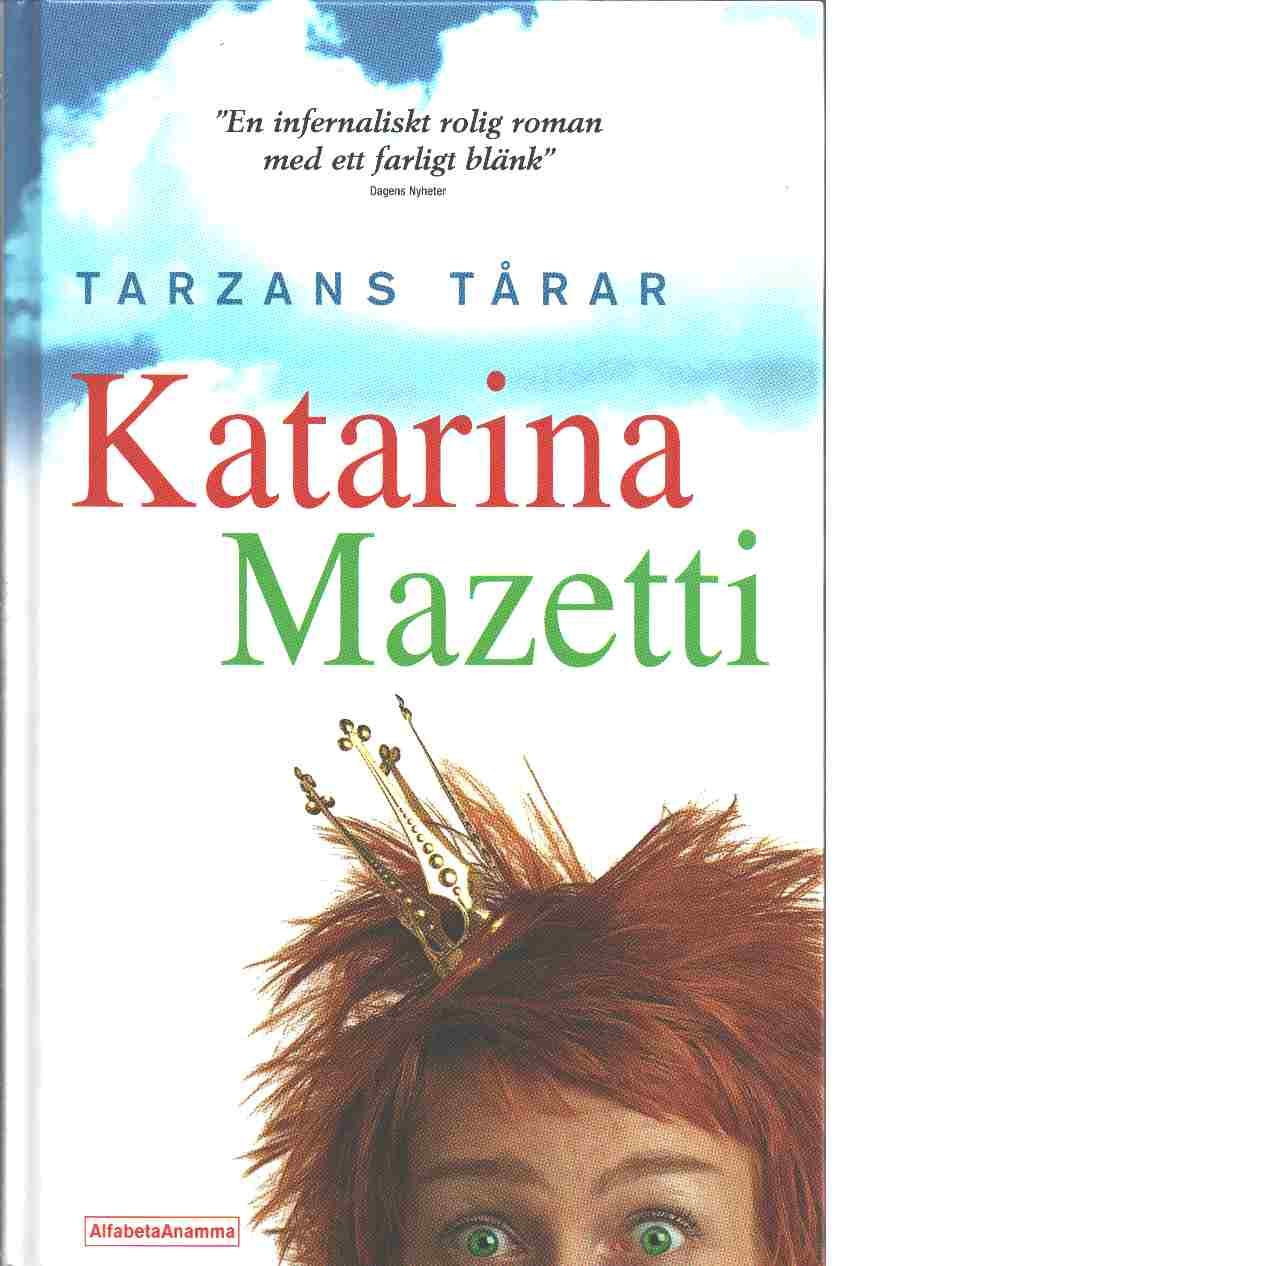 Tarzans tårar - Mazetti, Katarina